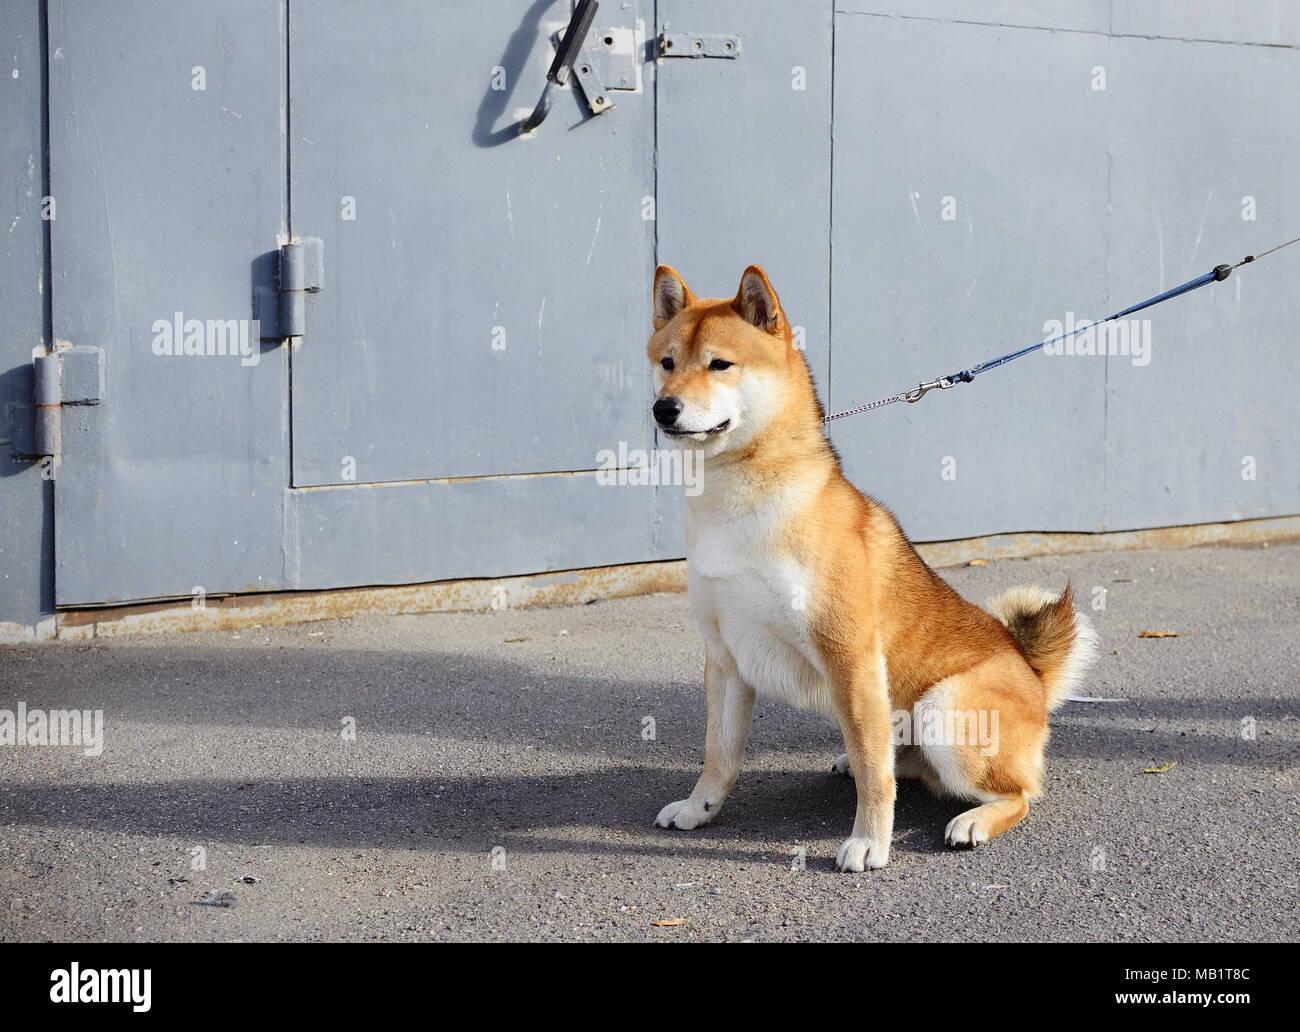 Dog Shiba Inu sits on a walk - Stock Image